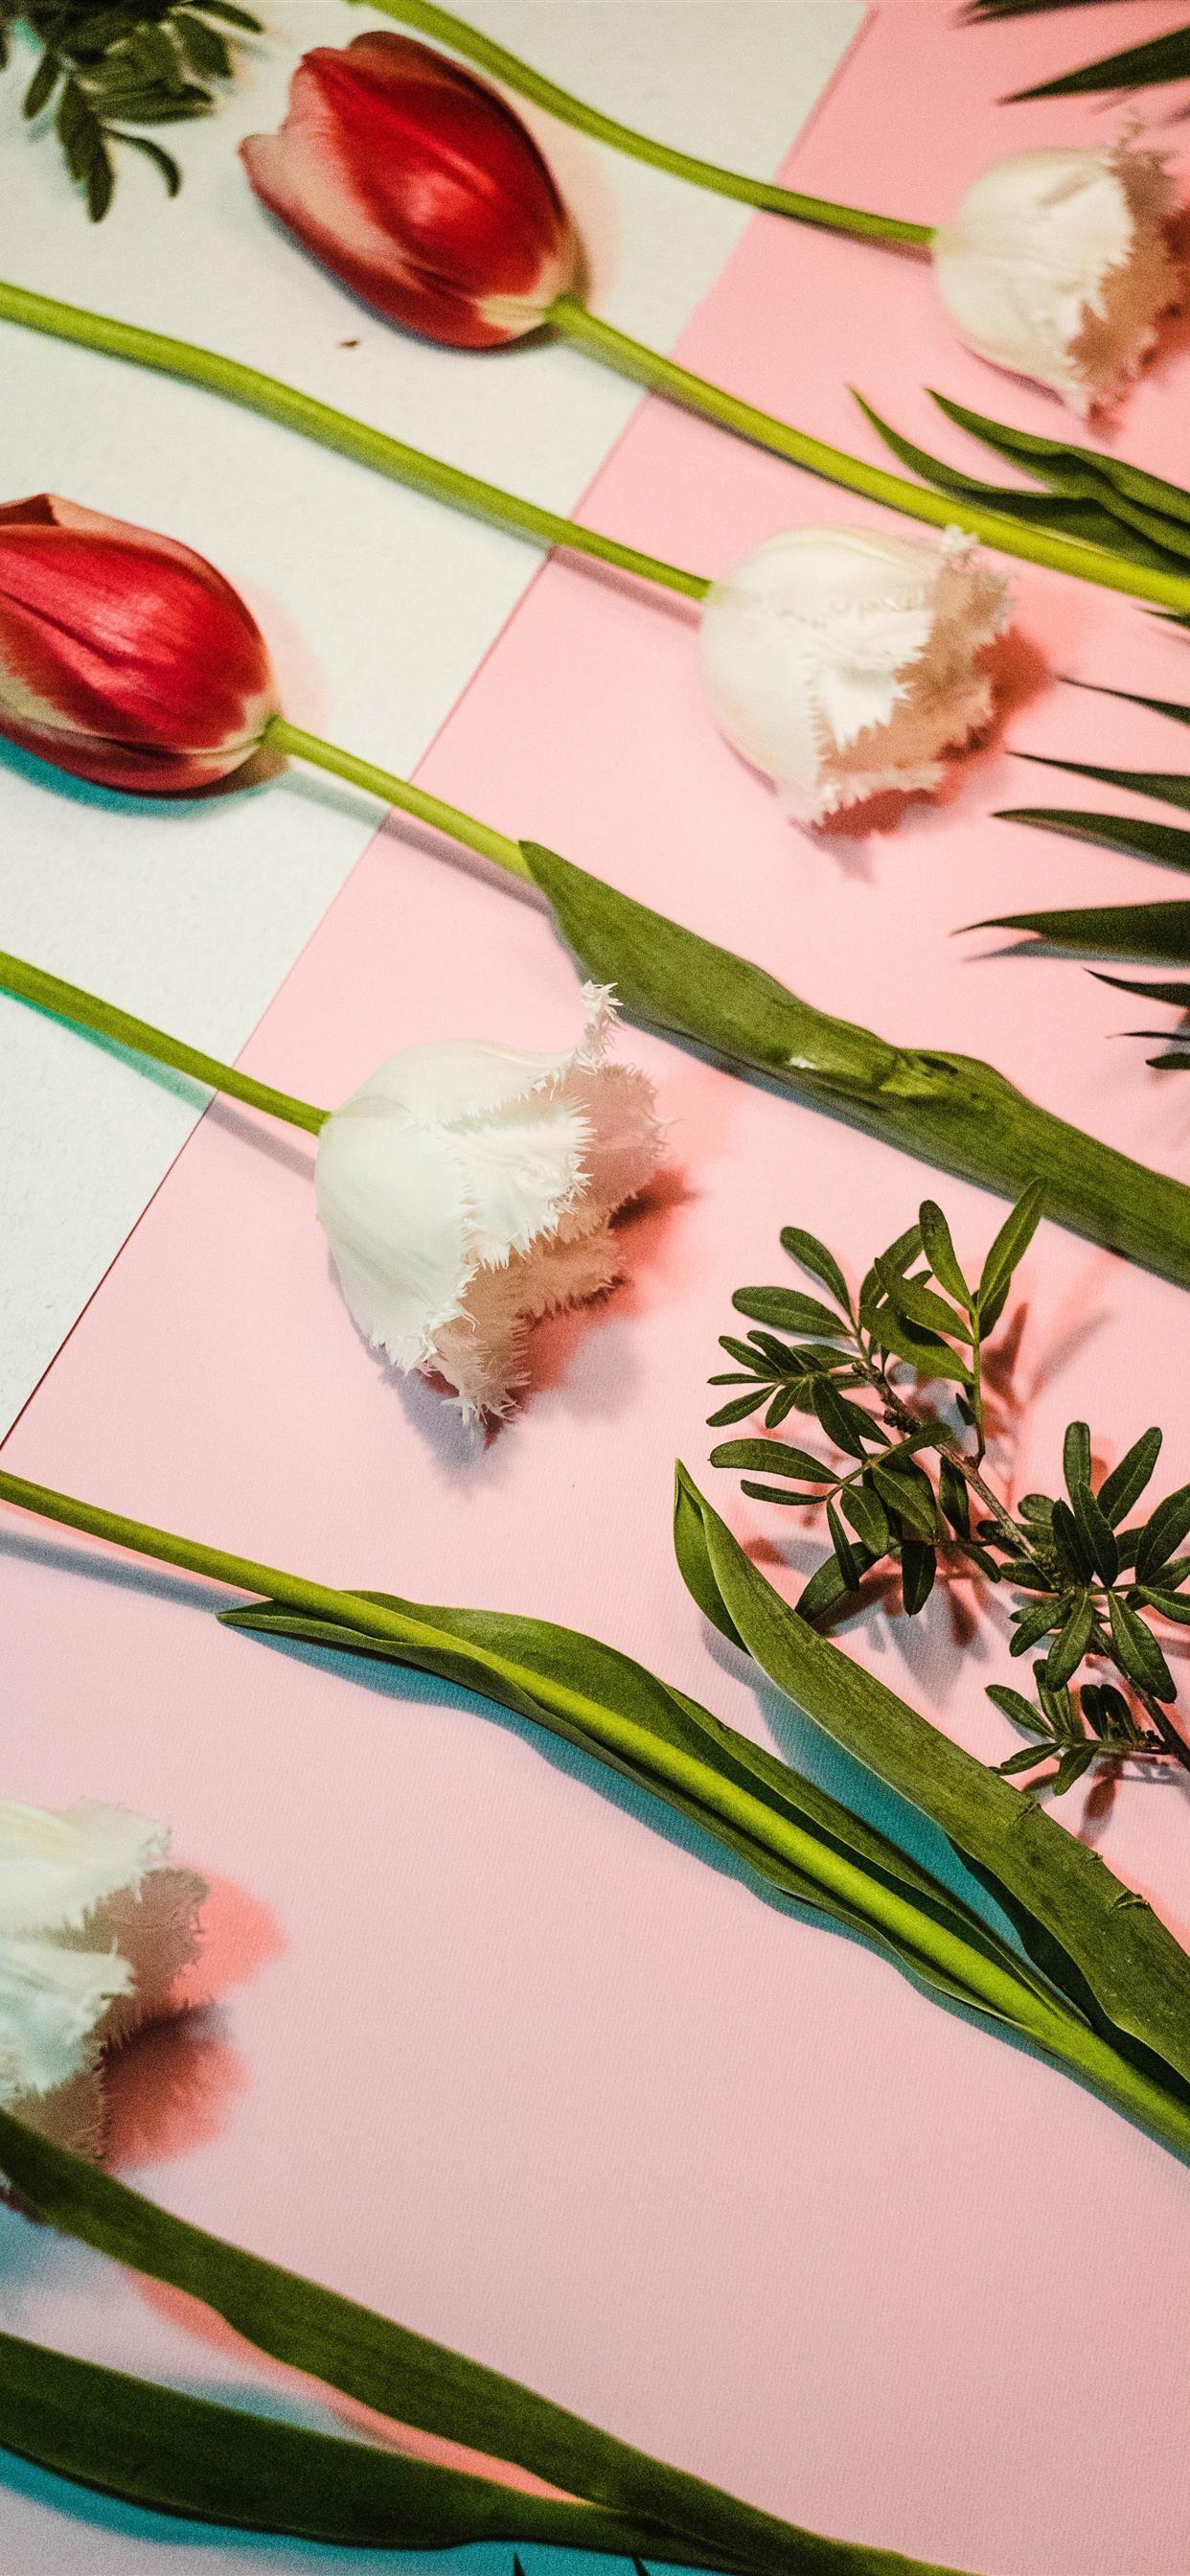 Tulipsomania iPhone se wallpaper